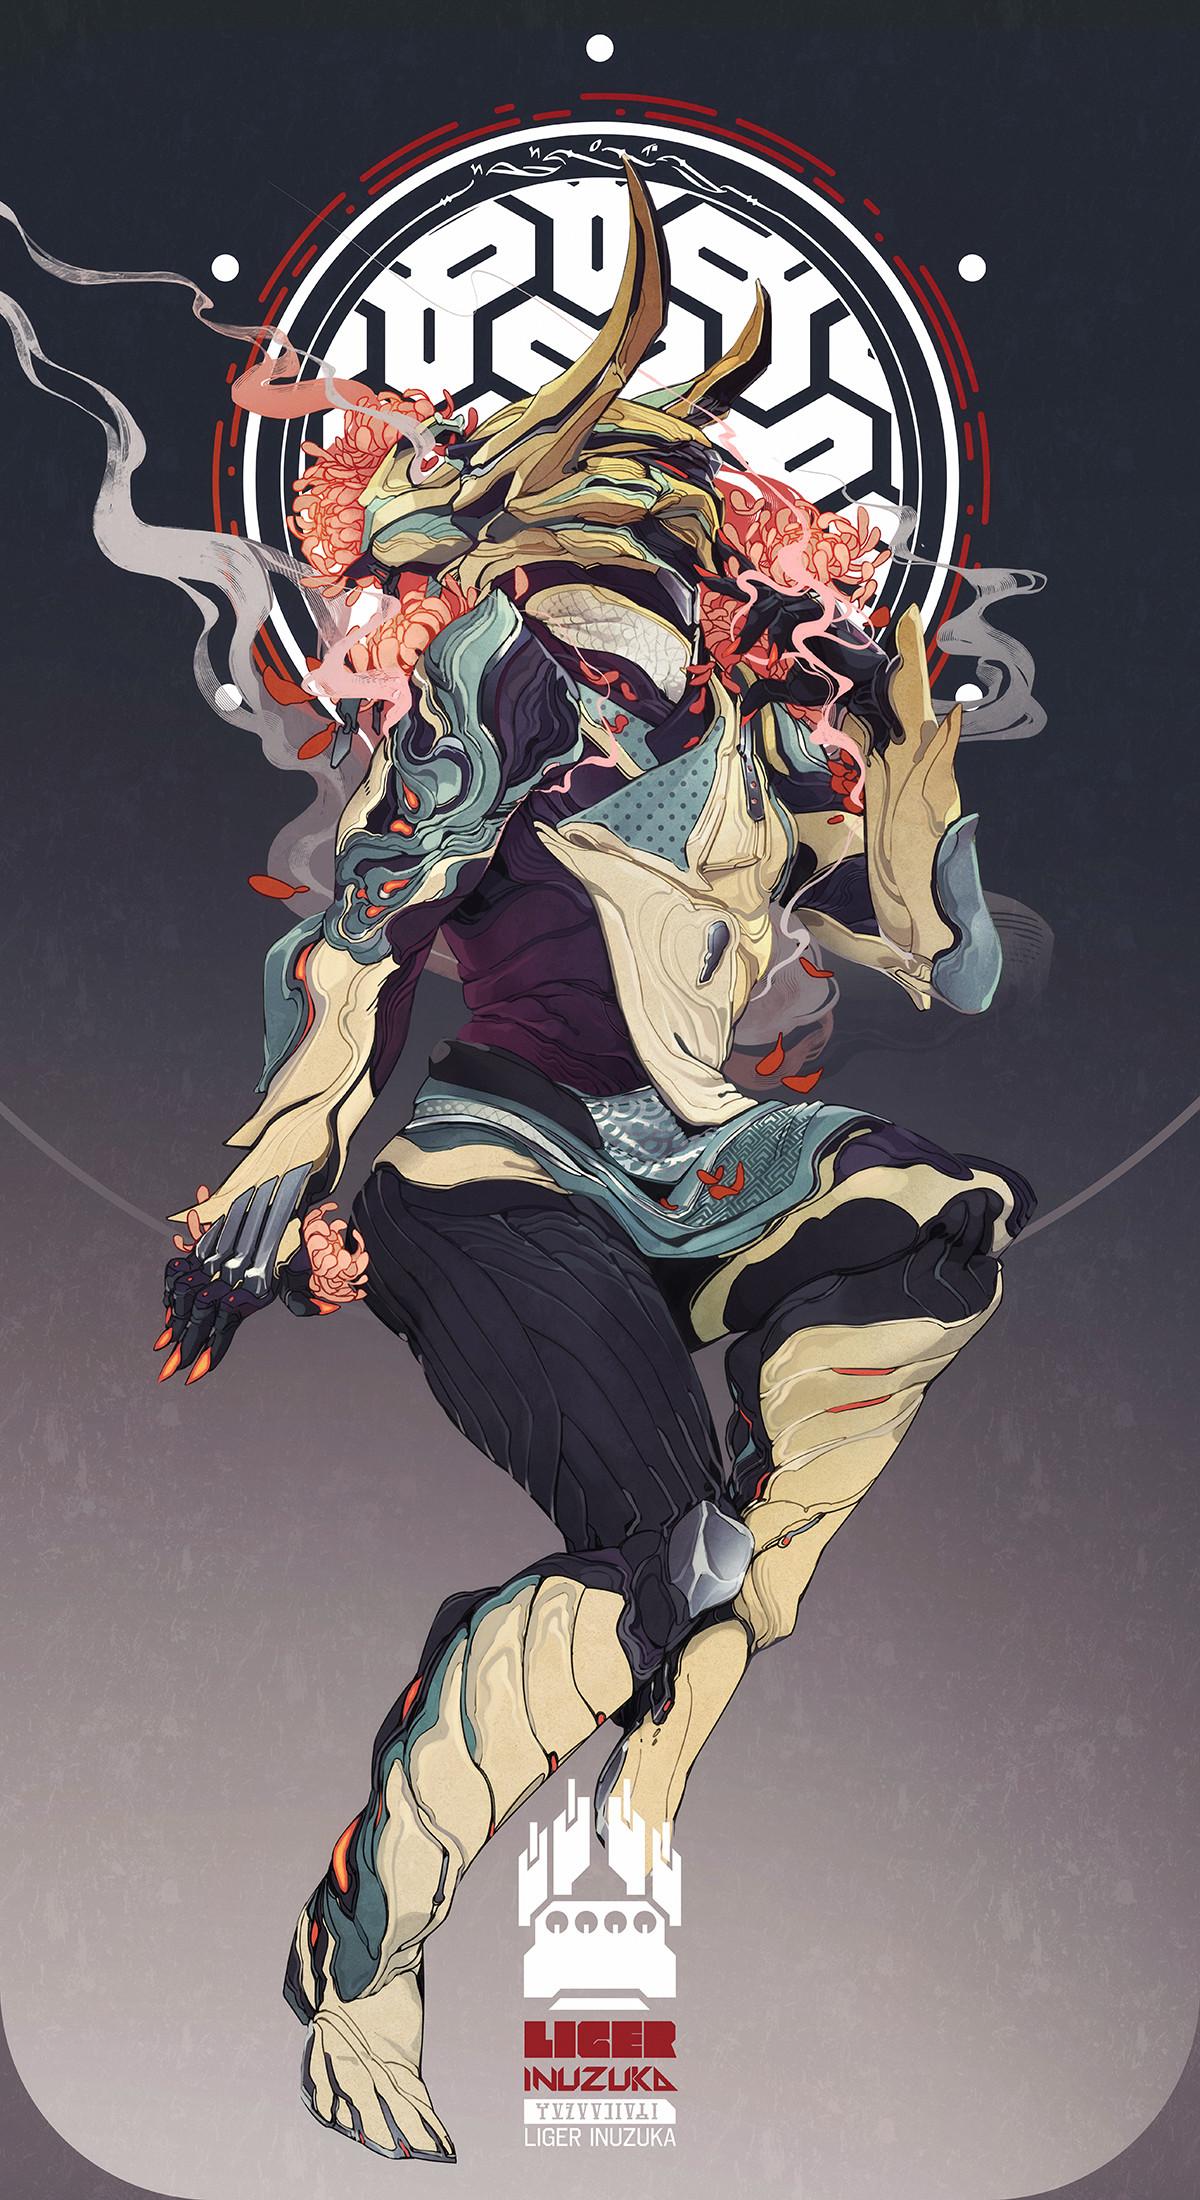 ArtStation - Warframe: Our Muse, Liger Inuzuka